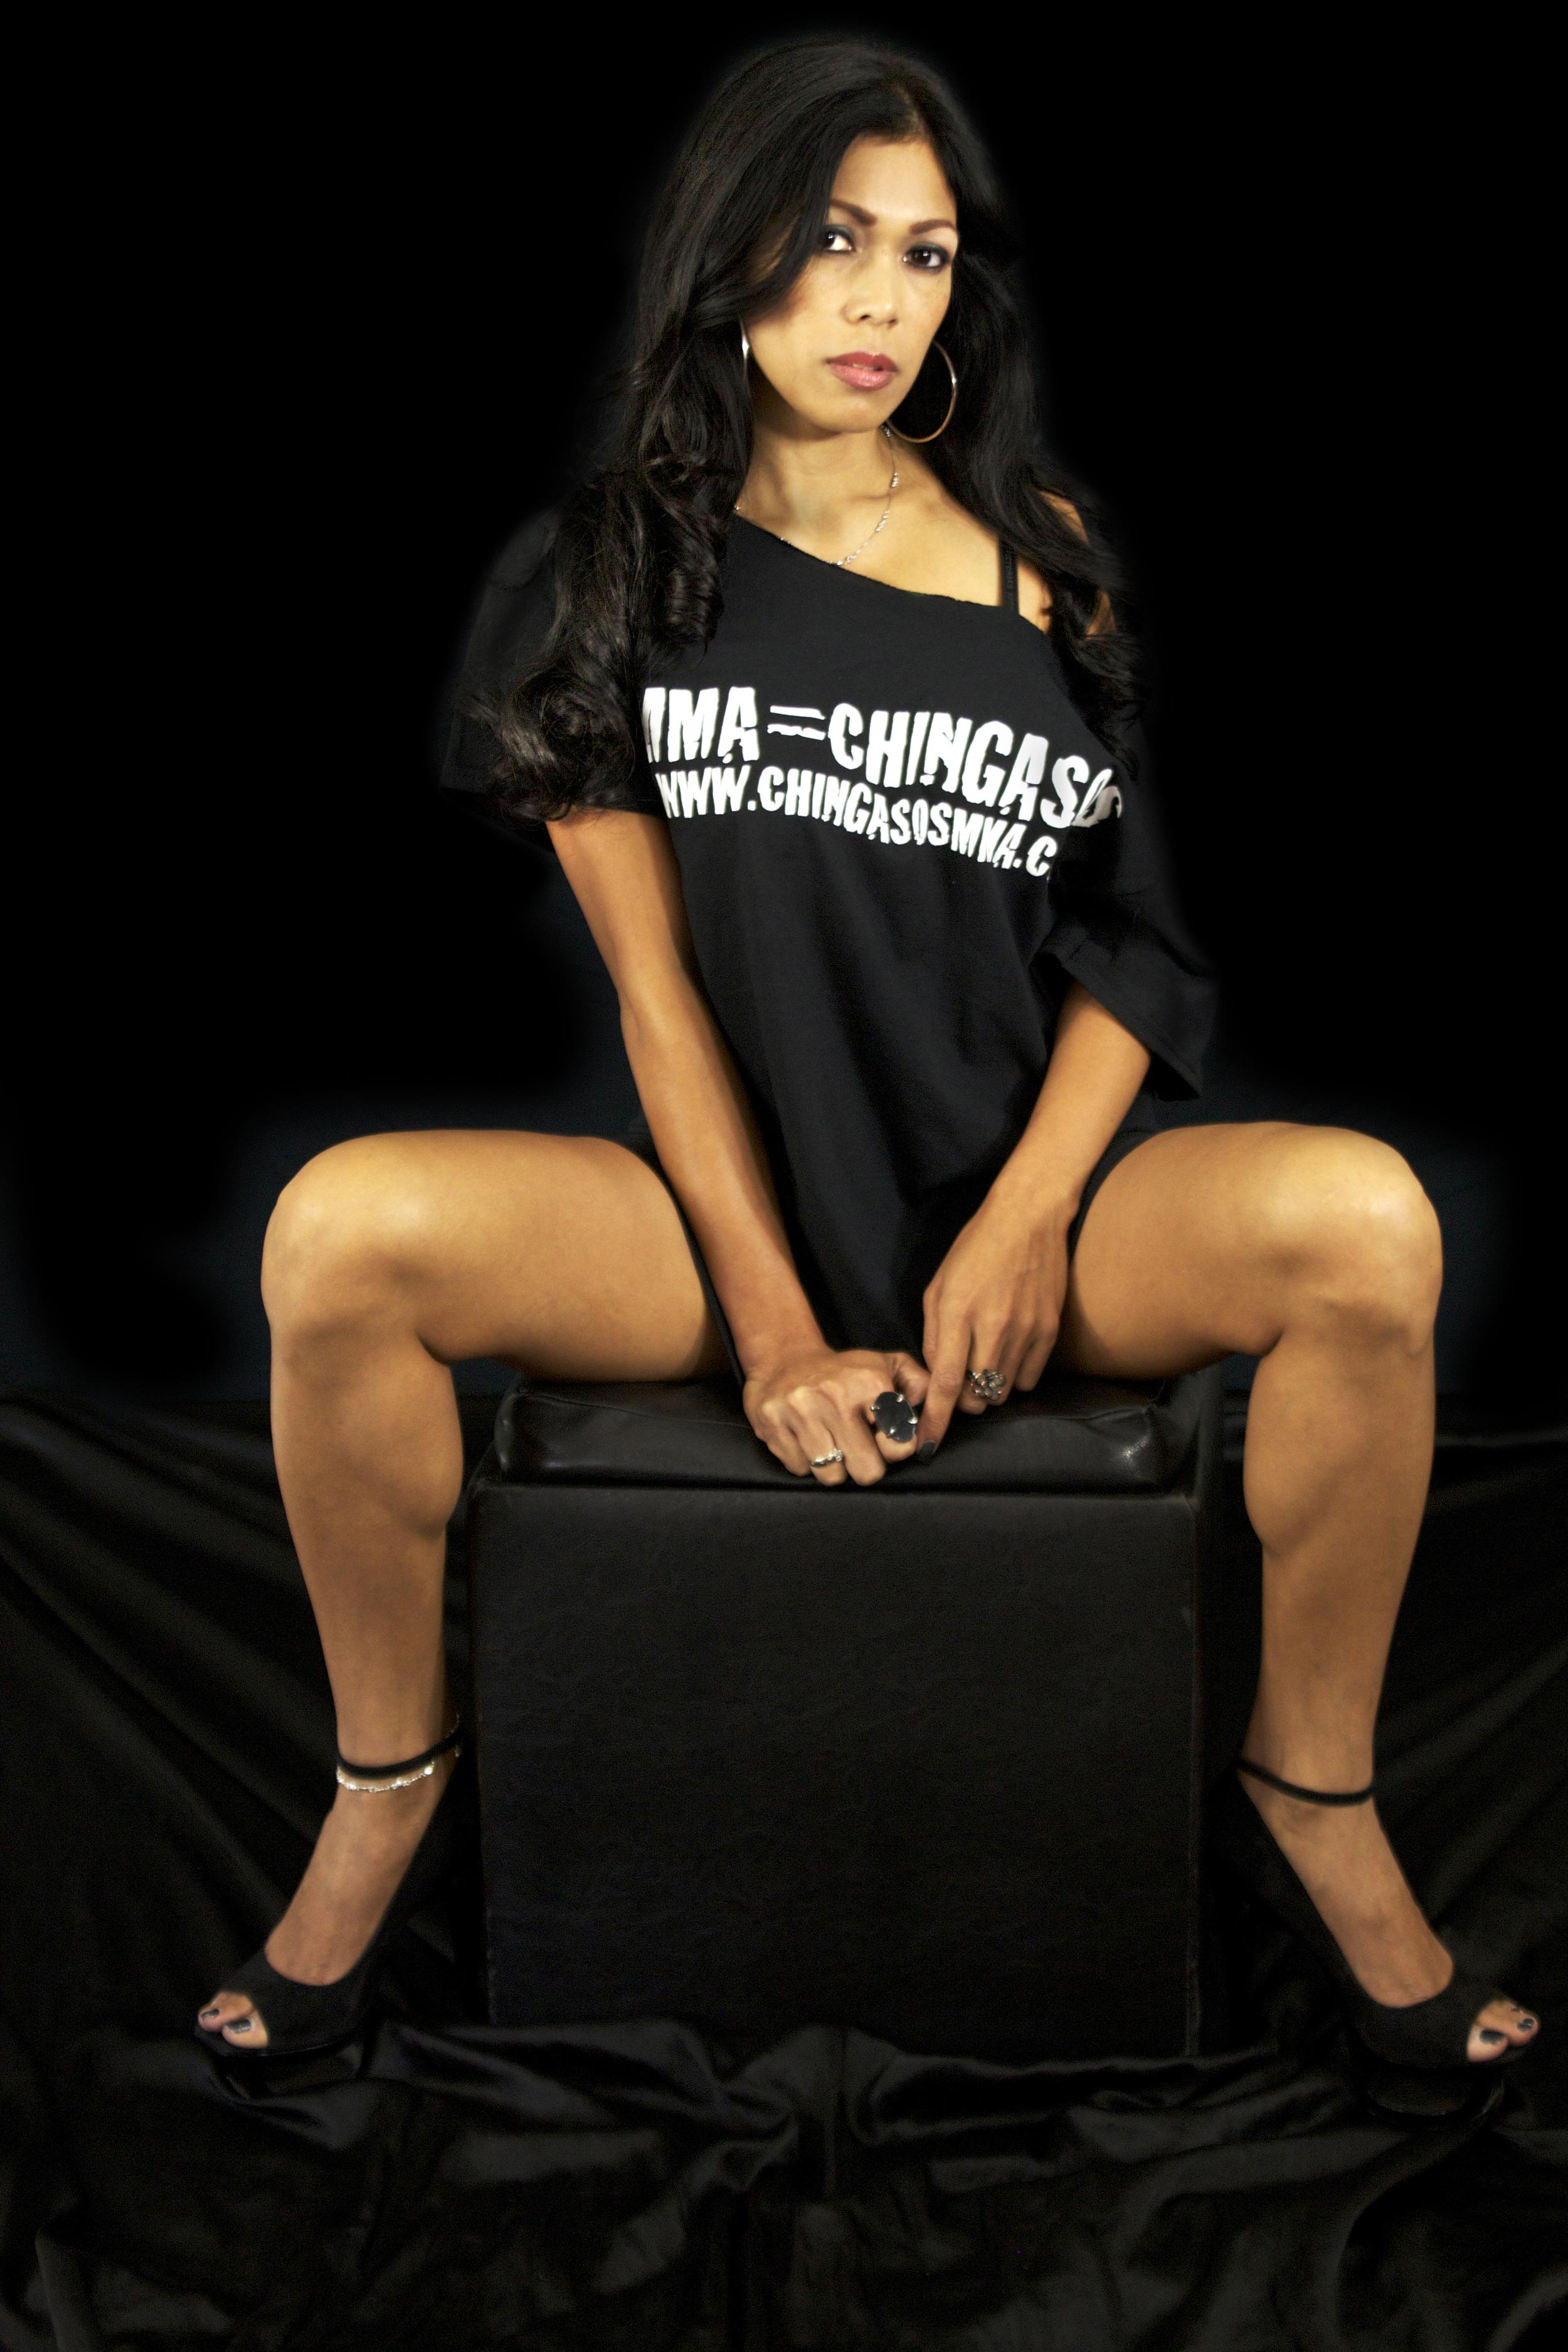 Sexy Ruchelle Rollie Robles Pasadena.jpg